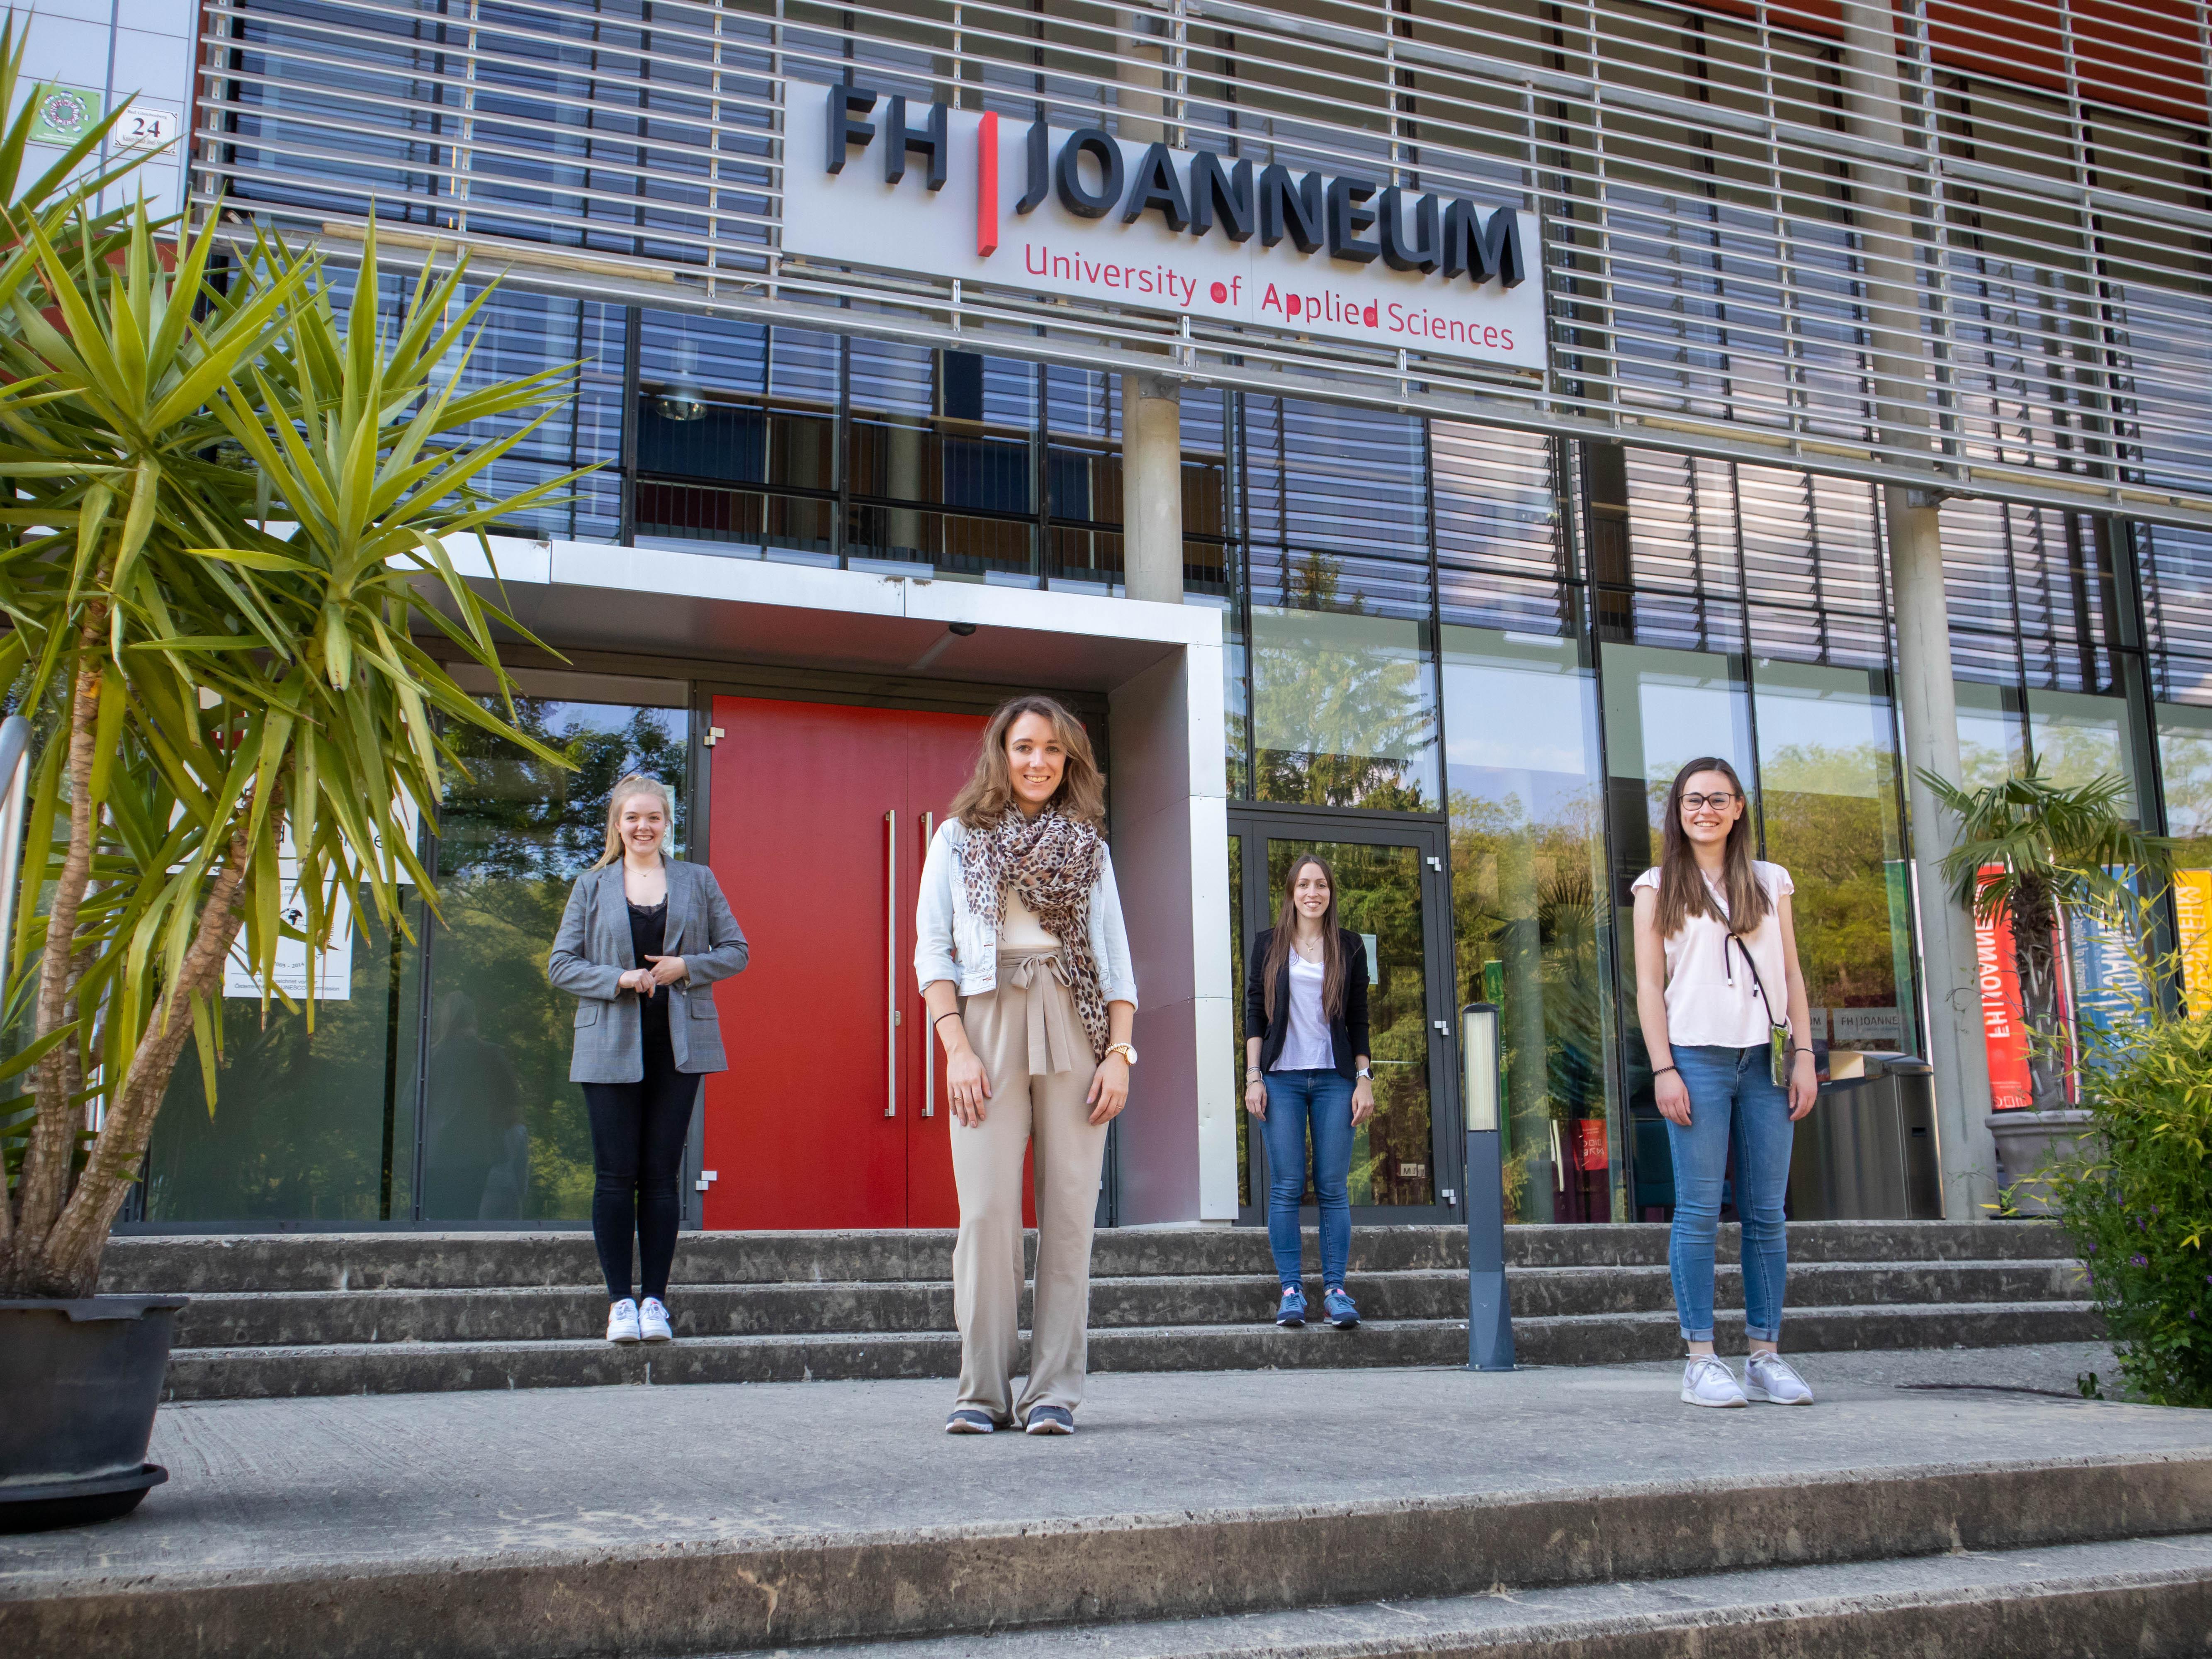 Das Projektteam: (v.l.n.r.) Jasmin Heyne, Theresa Riegler, Christine Frankl und Julia Meixner.